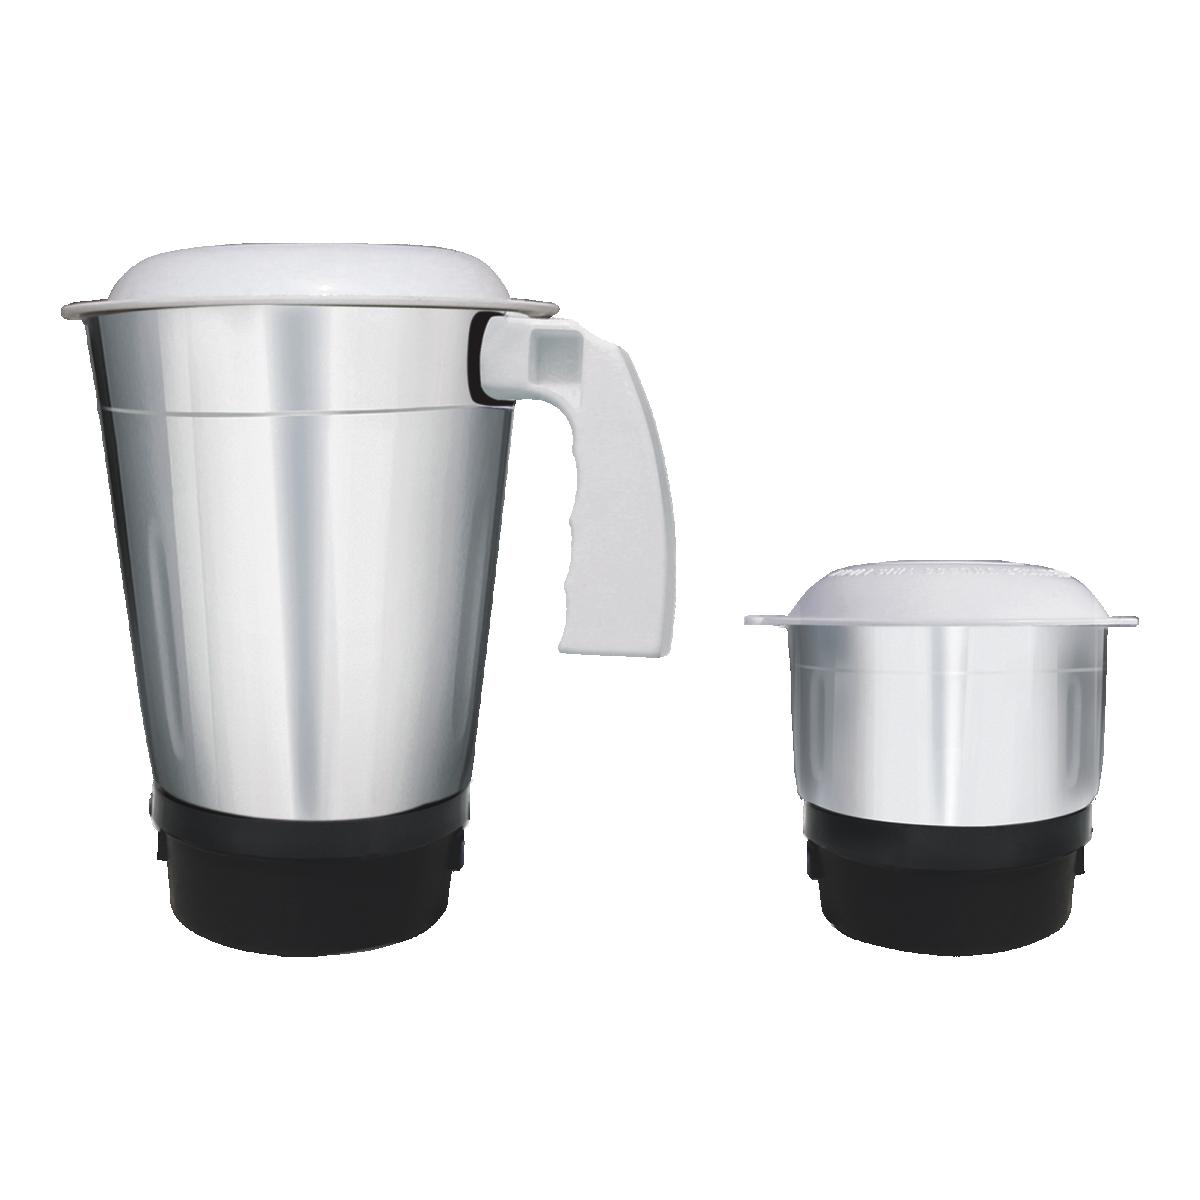 Fusion 2 Jars